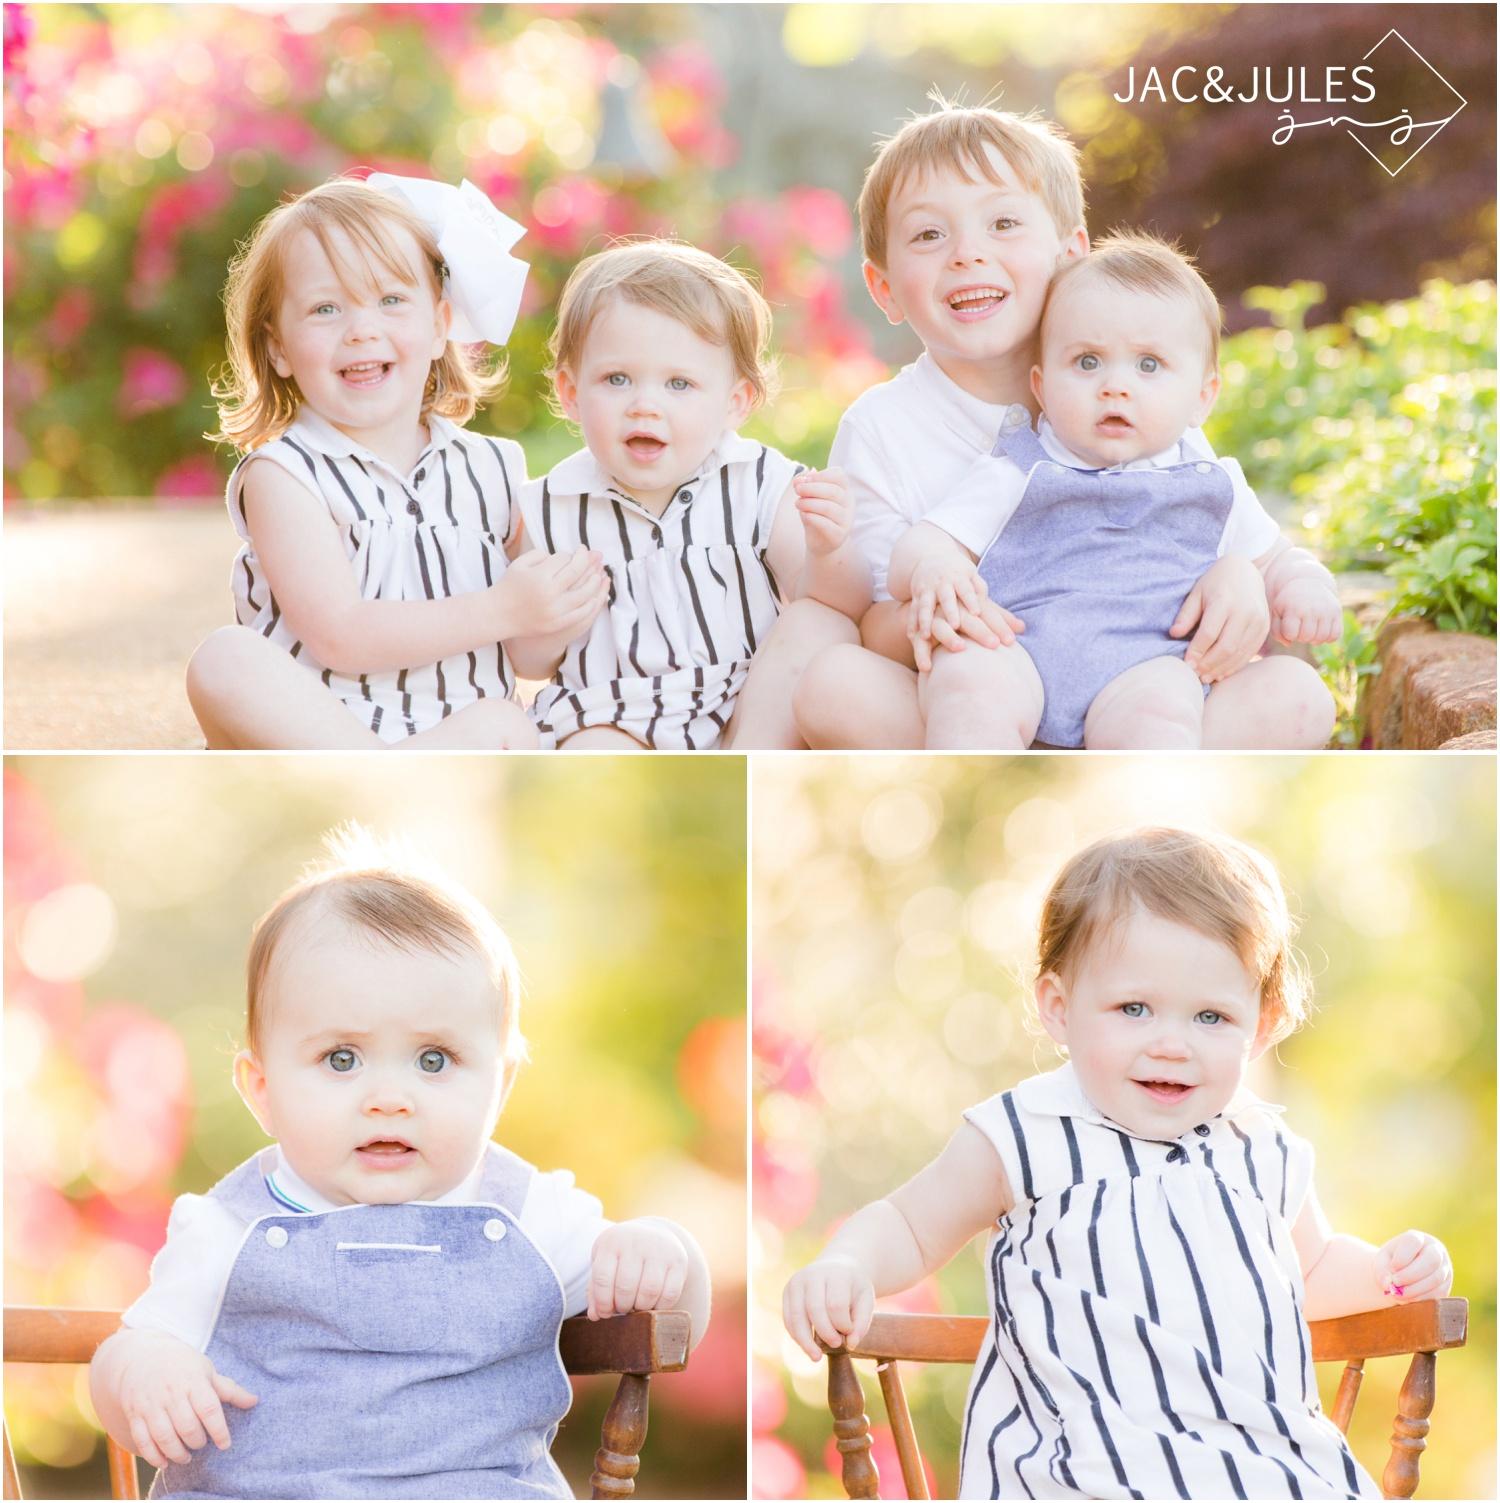 adorable ginger kids photos in spring lake, nj